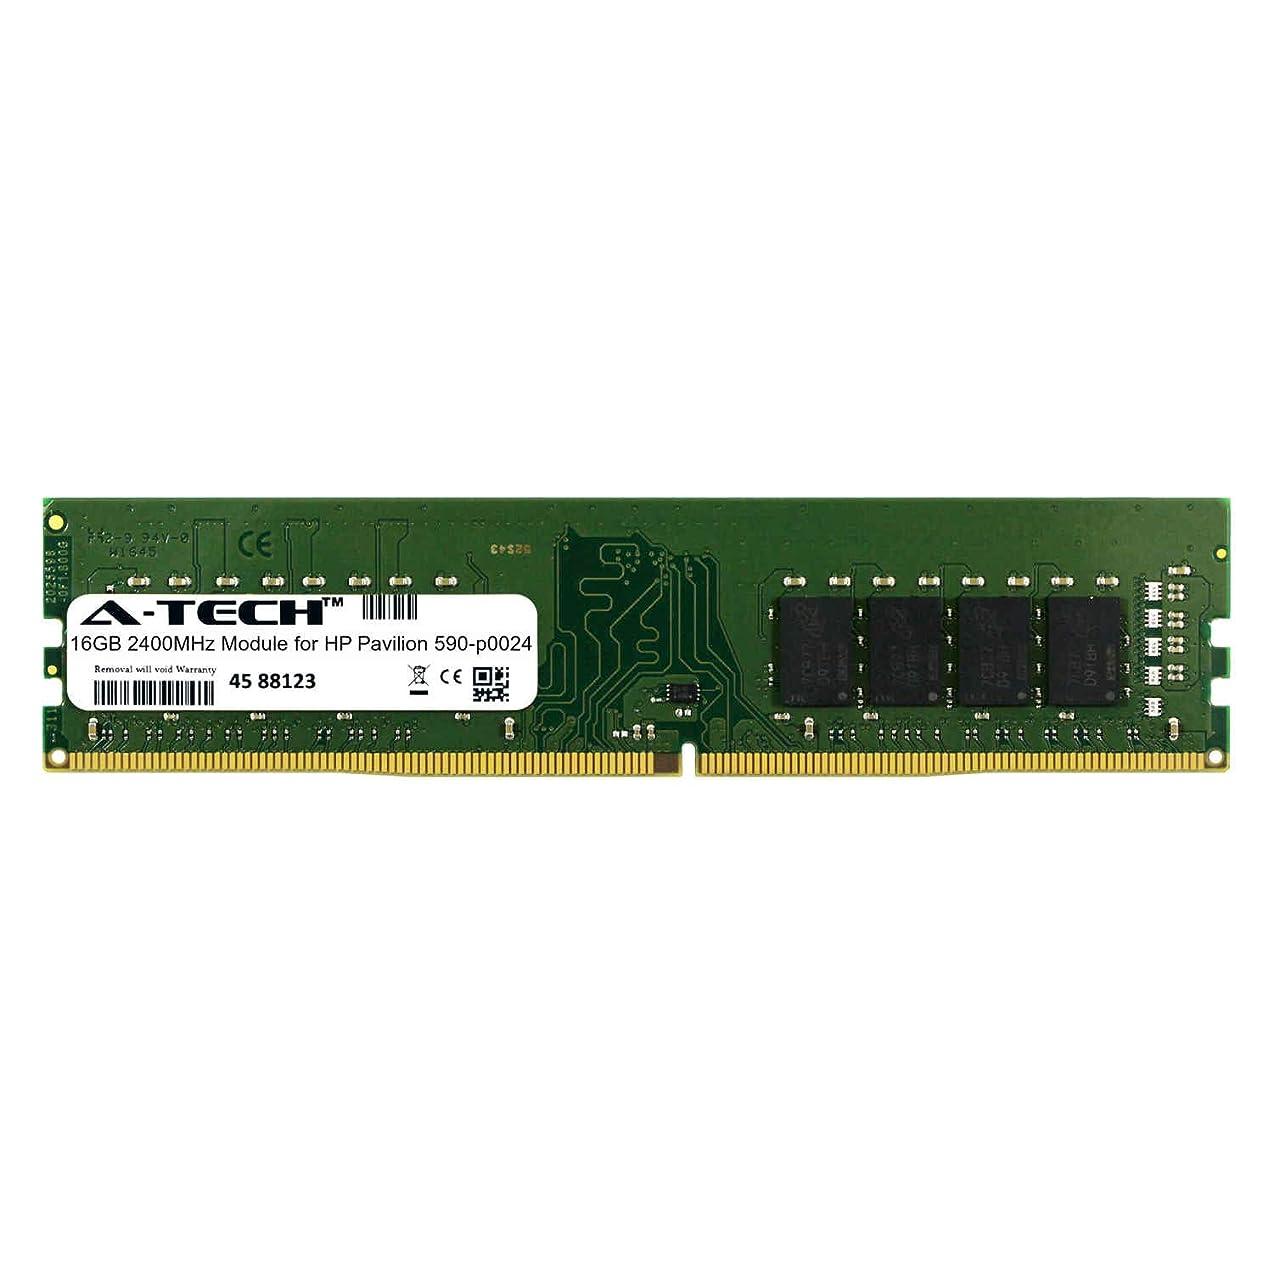 A-Tech 16GB Module for HP Pavilion 590-p0024 Desktop & Workstation Motherboard Compatible DDR4 2400Mhz Memory Ram (ATMS311275A25822X1)